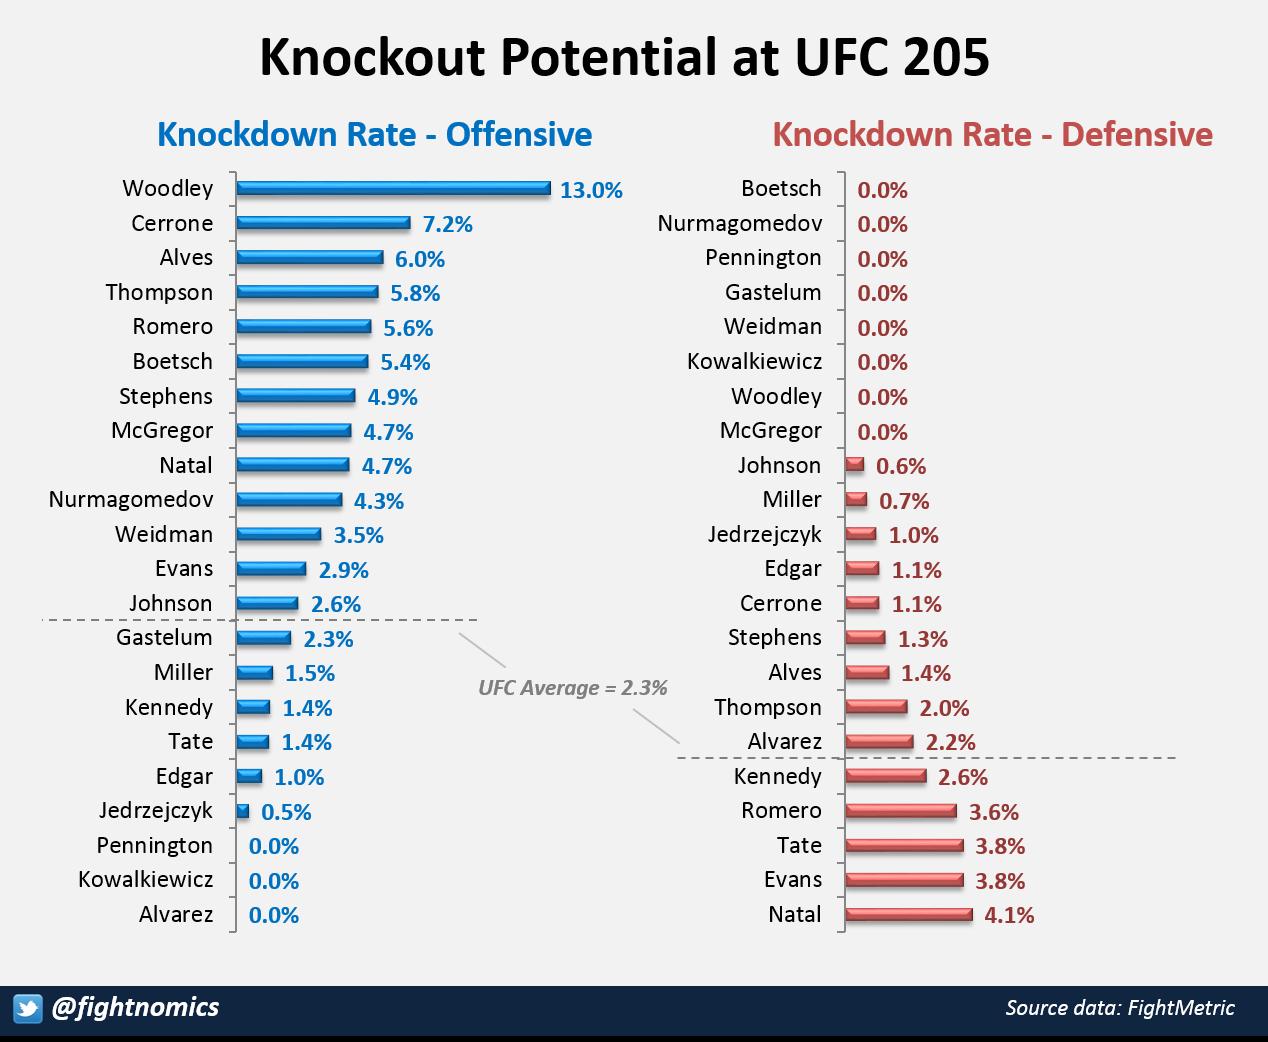 UFC205 KO Potential